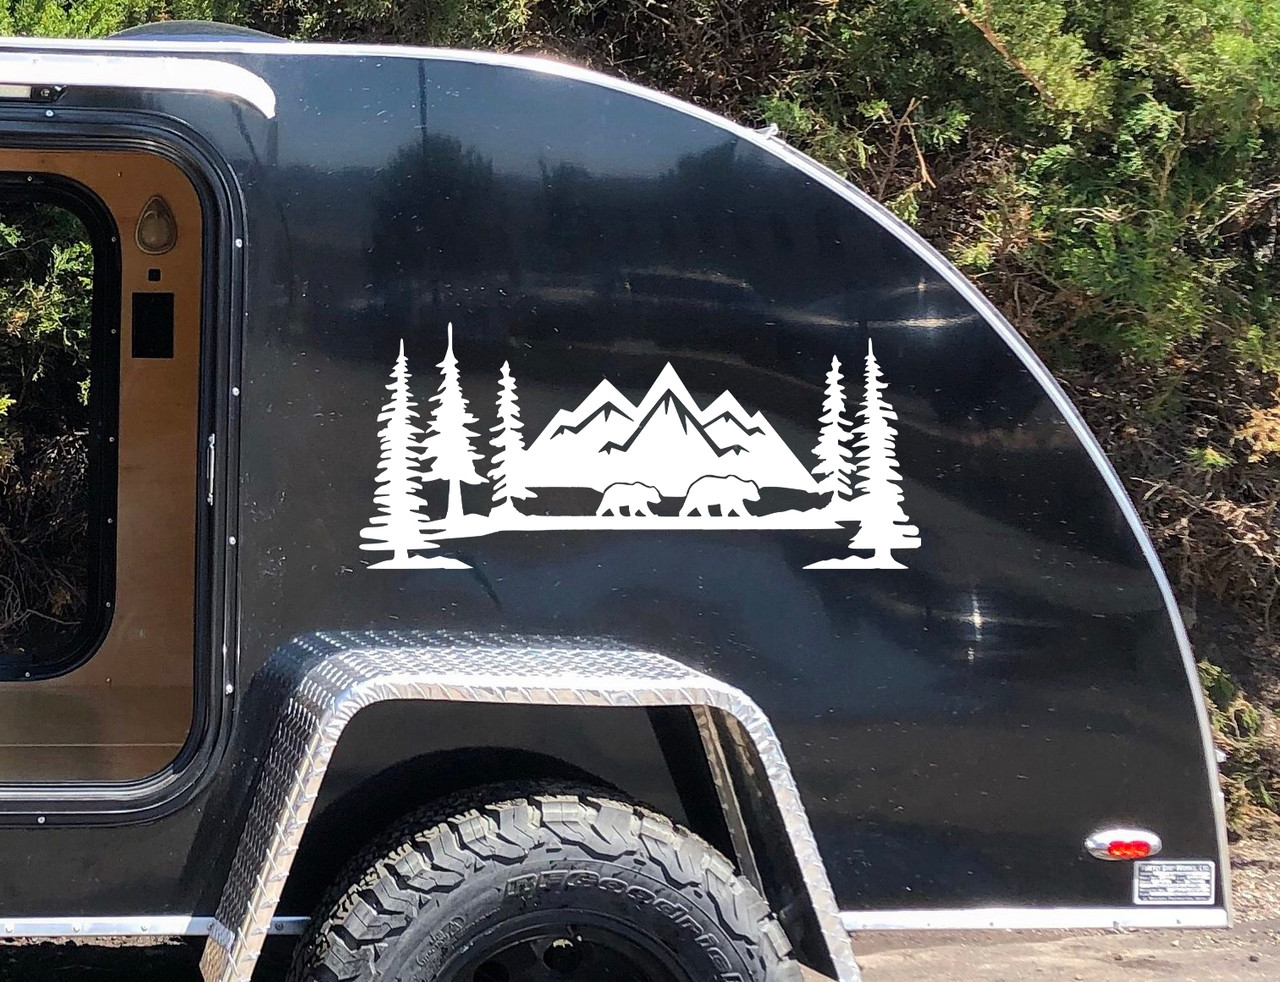 Mountains Bears Forest Scene Vinyl Decal V2 - Camper RV Travel Trailer Graphics 4x4 - Die Cut Sticker